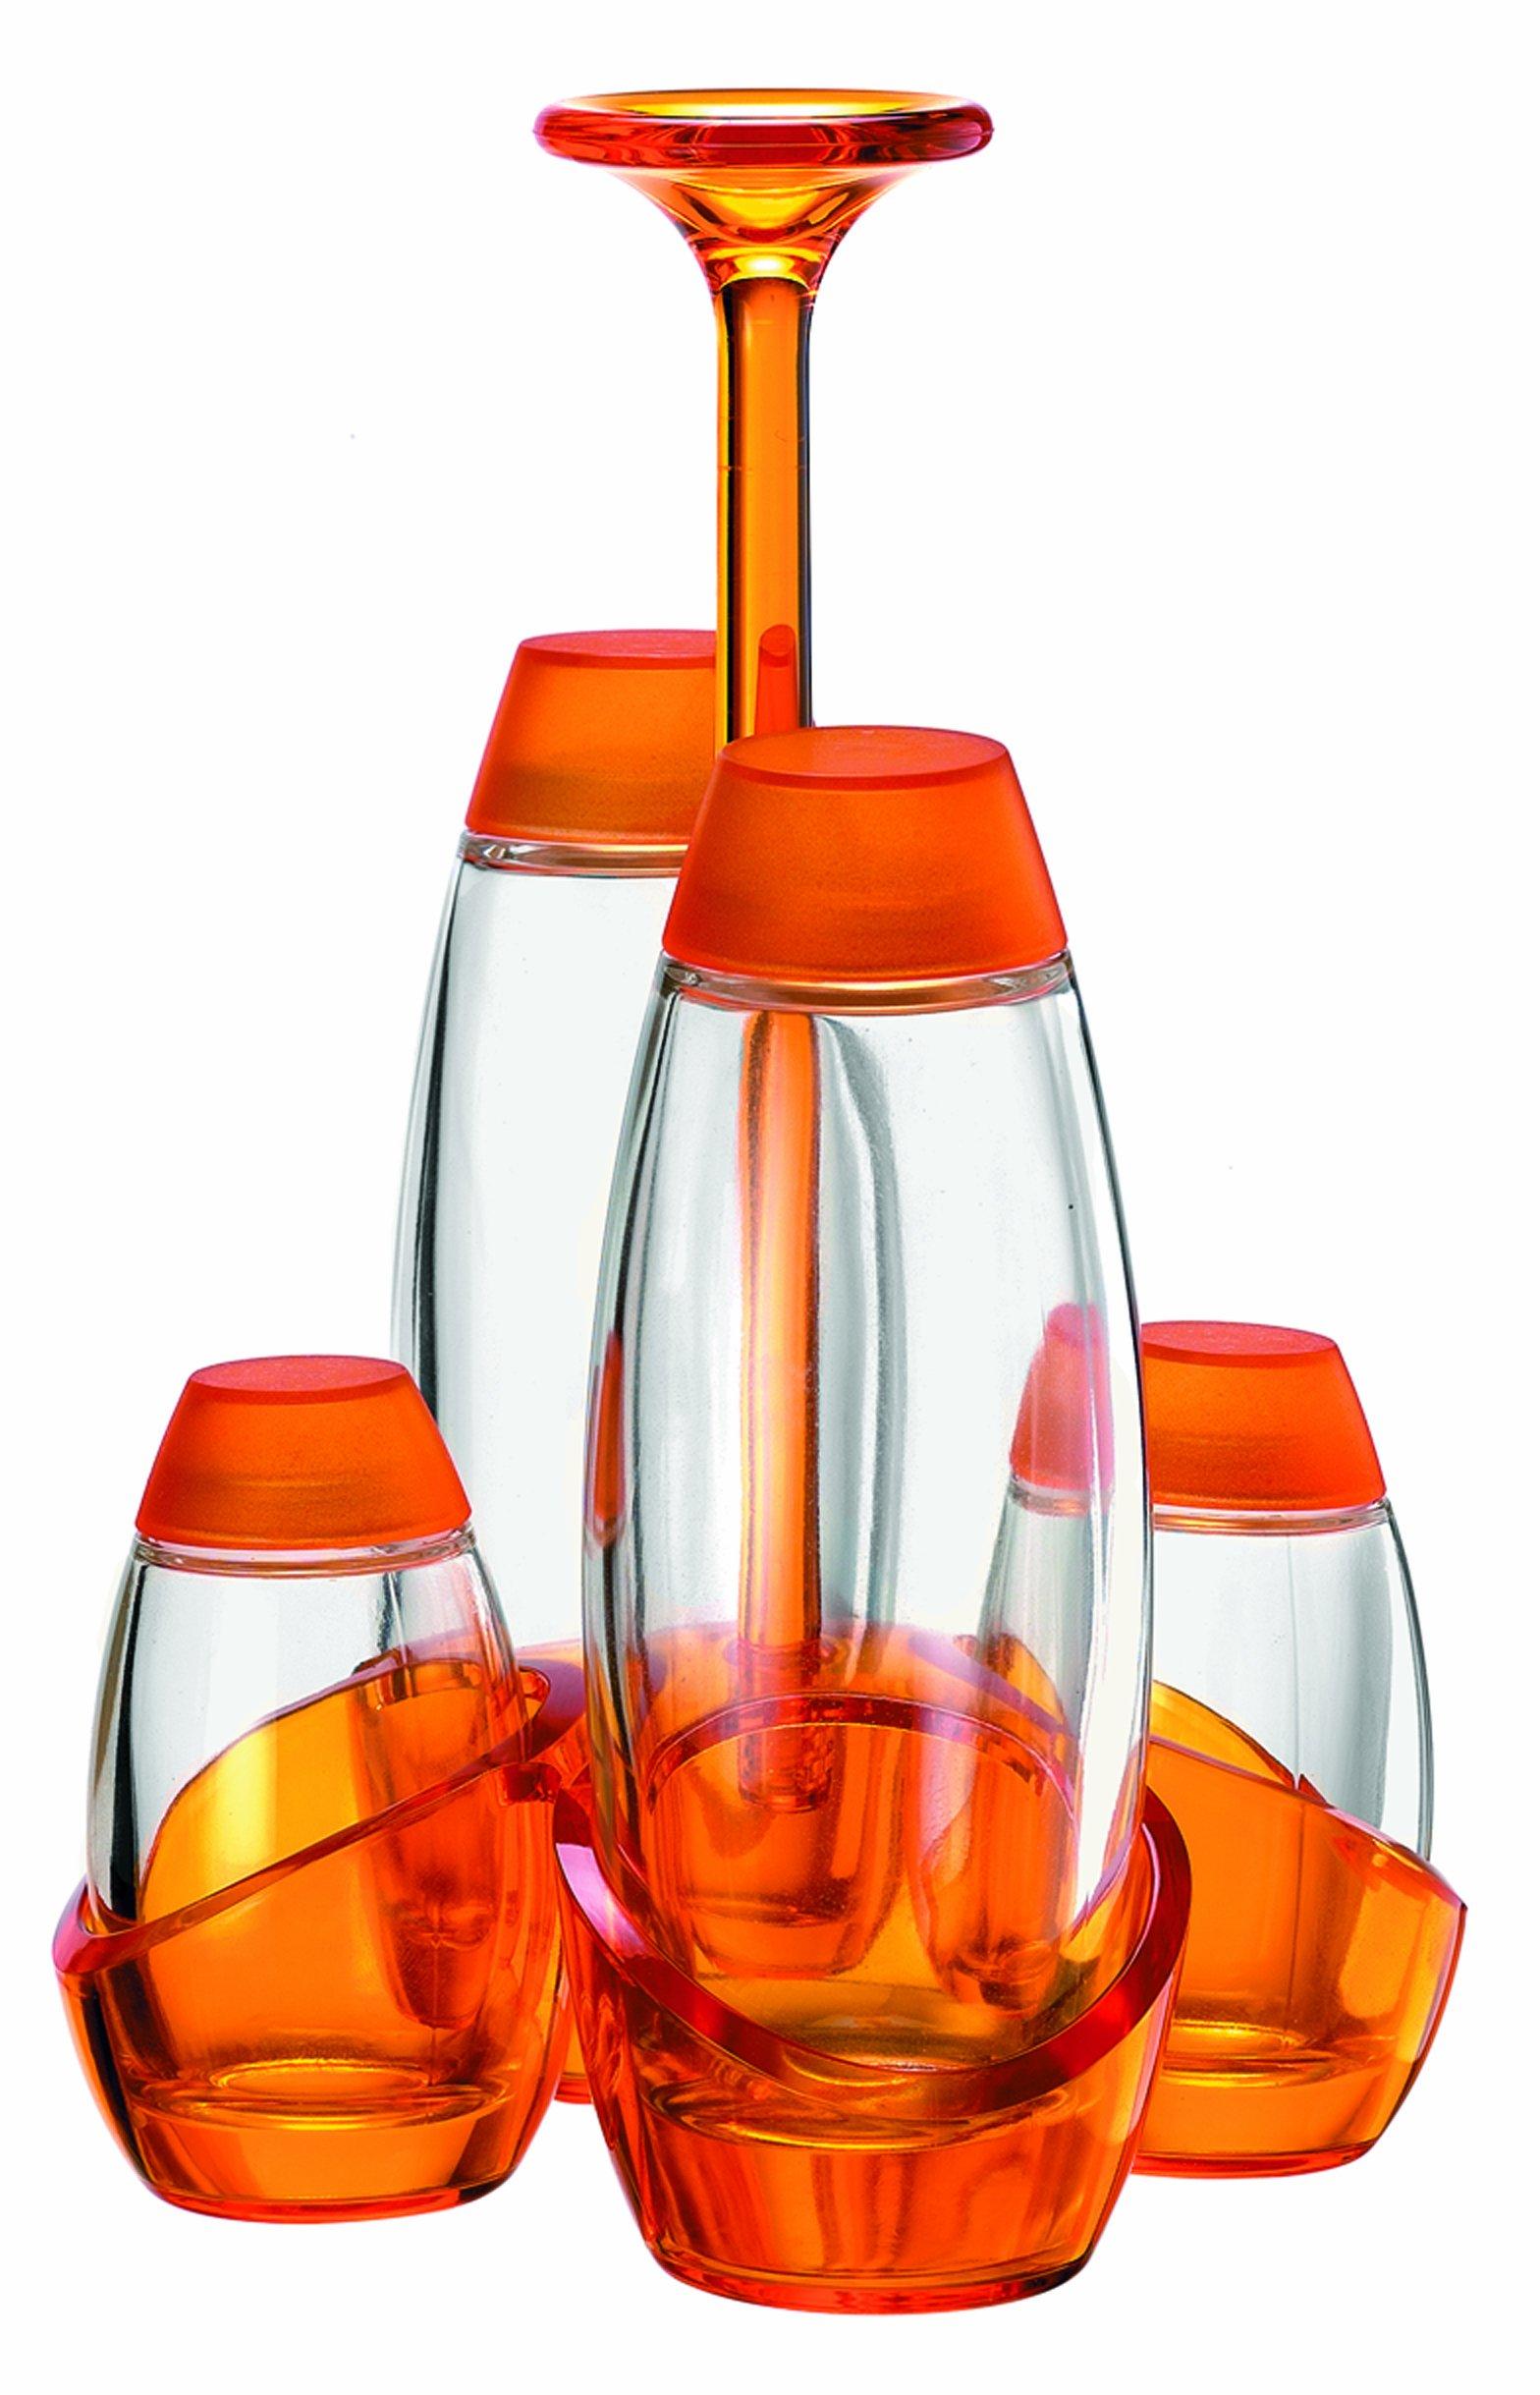 Guzzini GU-2348.00-45 Gemme Cruet Set, 6-Ounce/2-Ounce, Orange